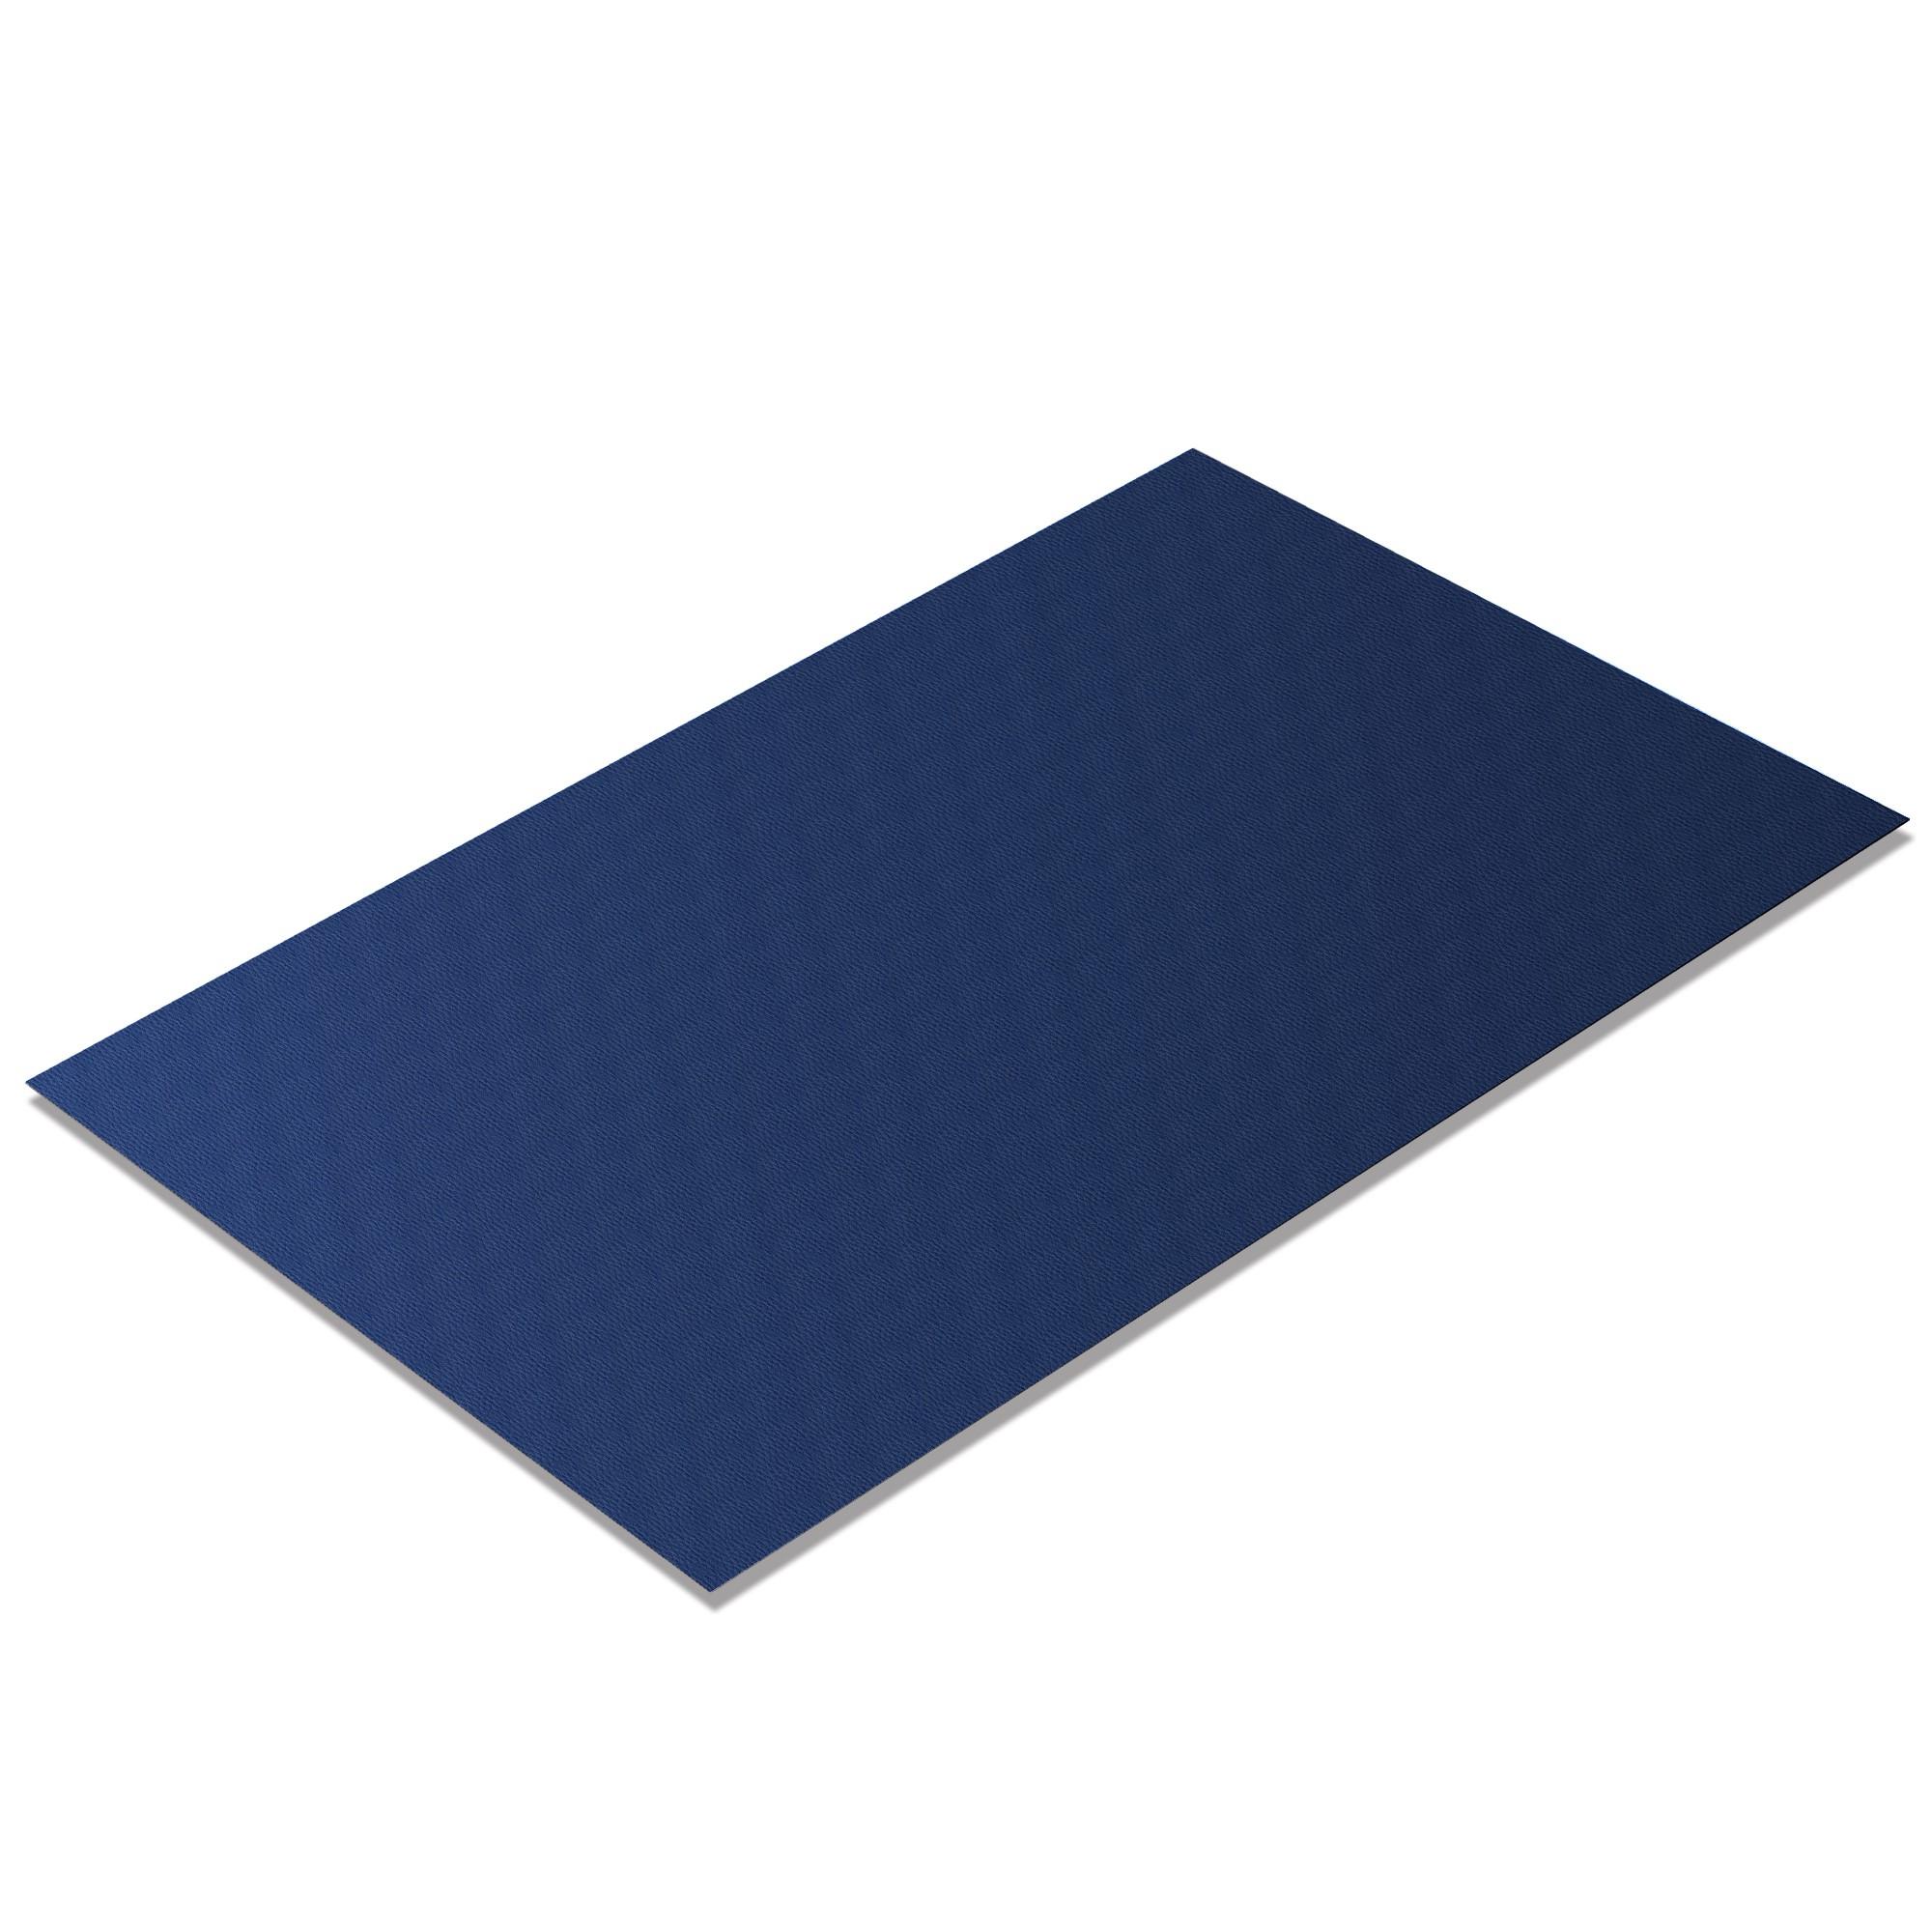 kunstleder meterware nevada dunkelblau nev635. Black Bedroom Furniture Sets. Home Design Ideas